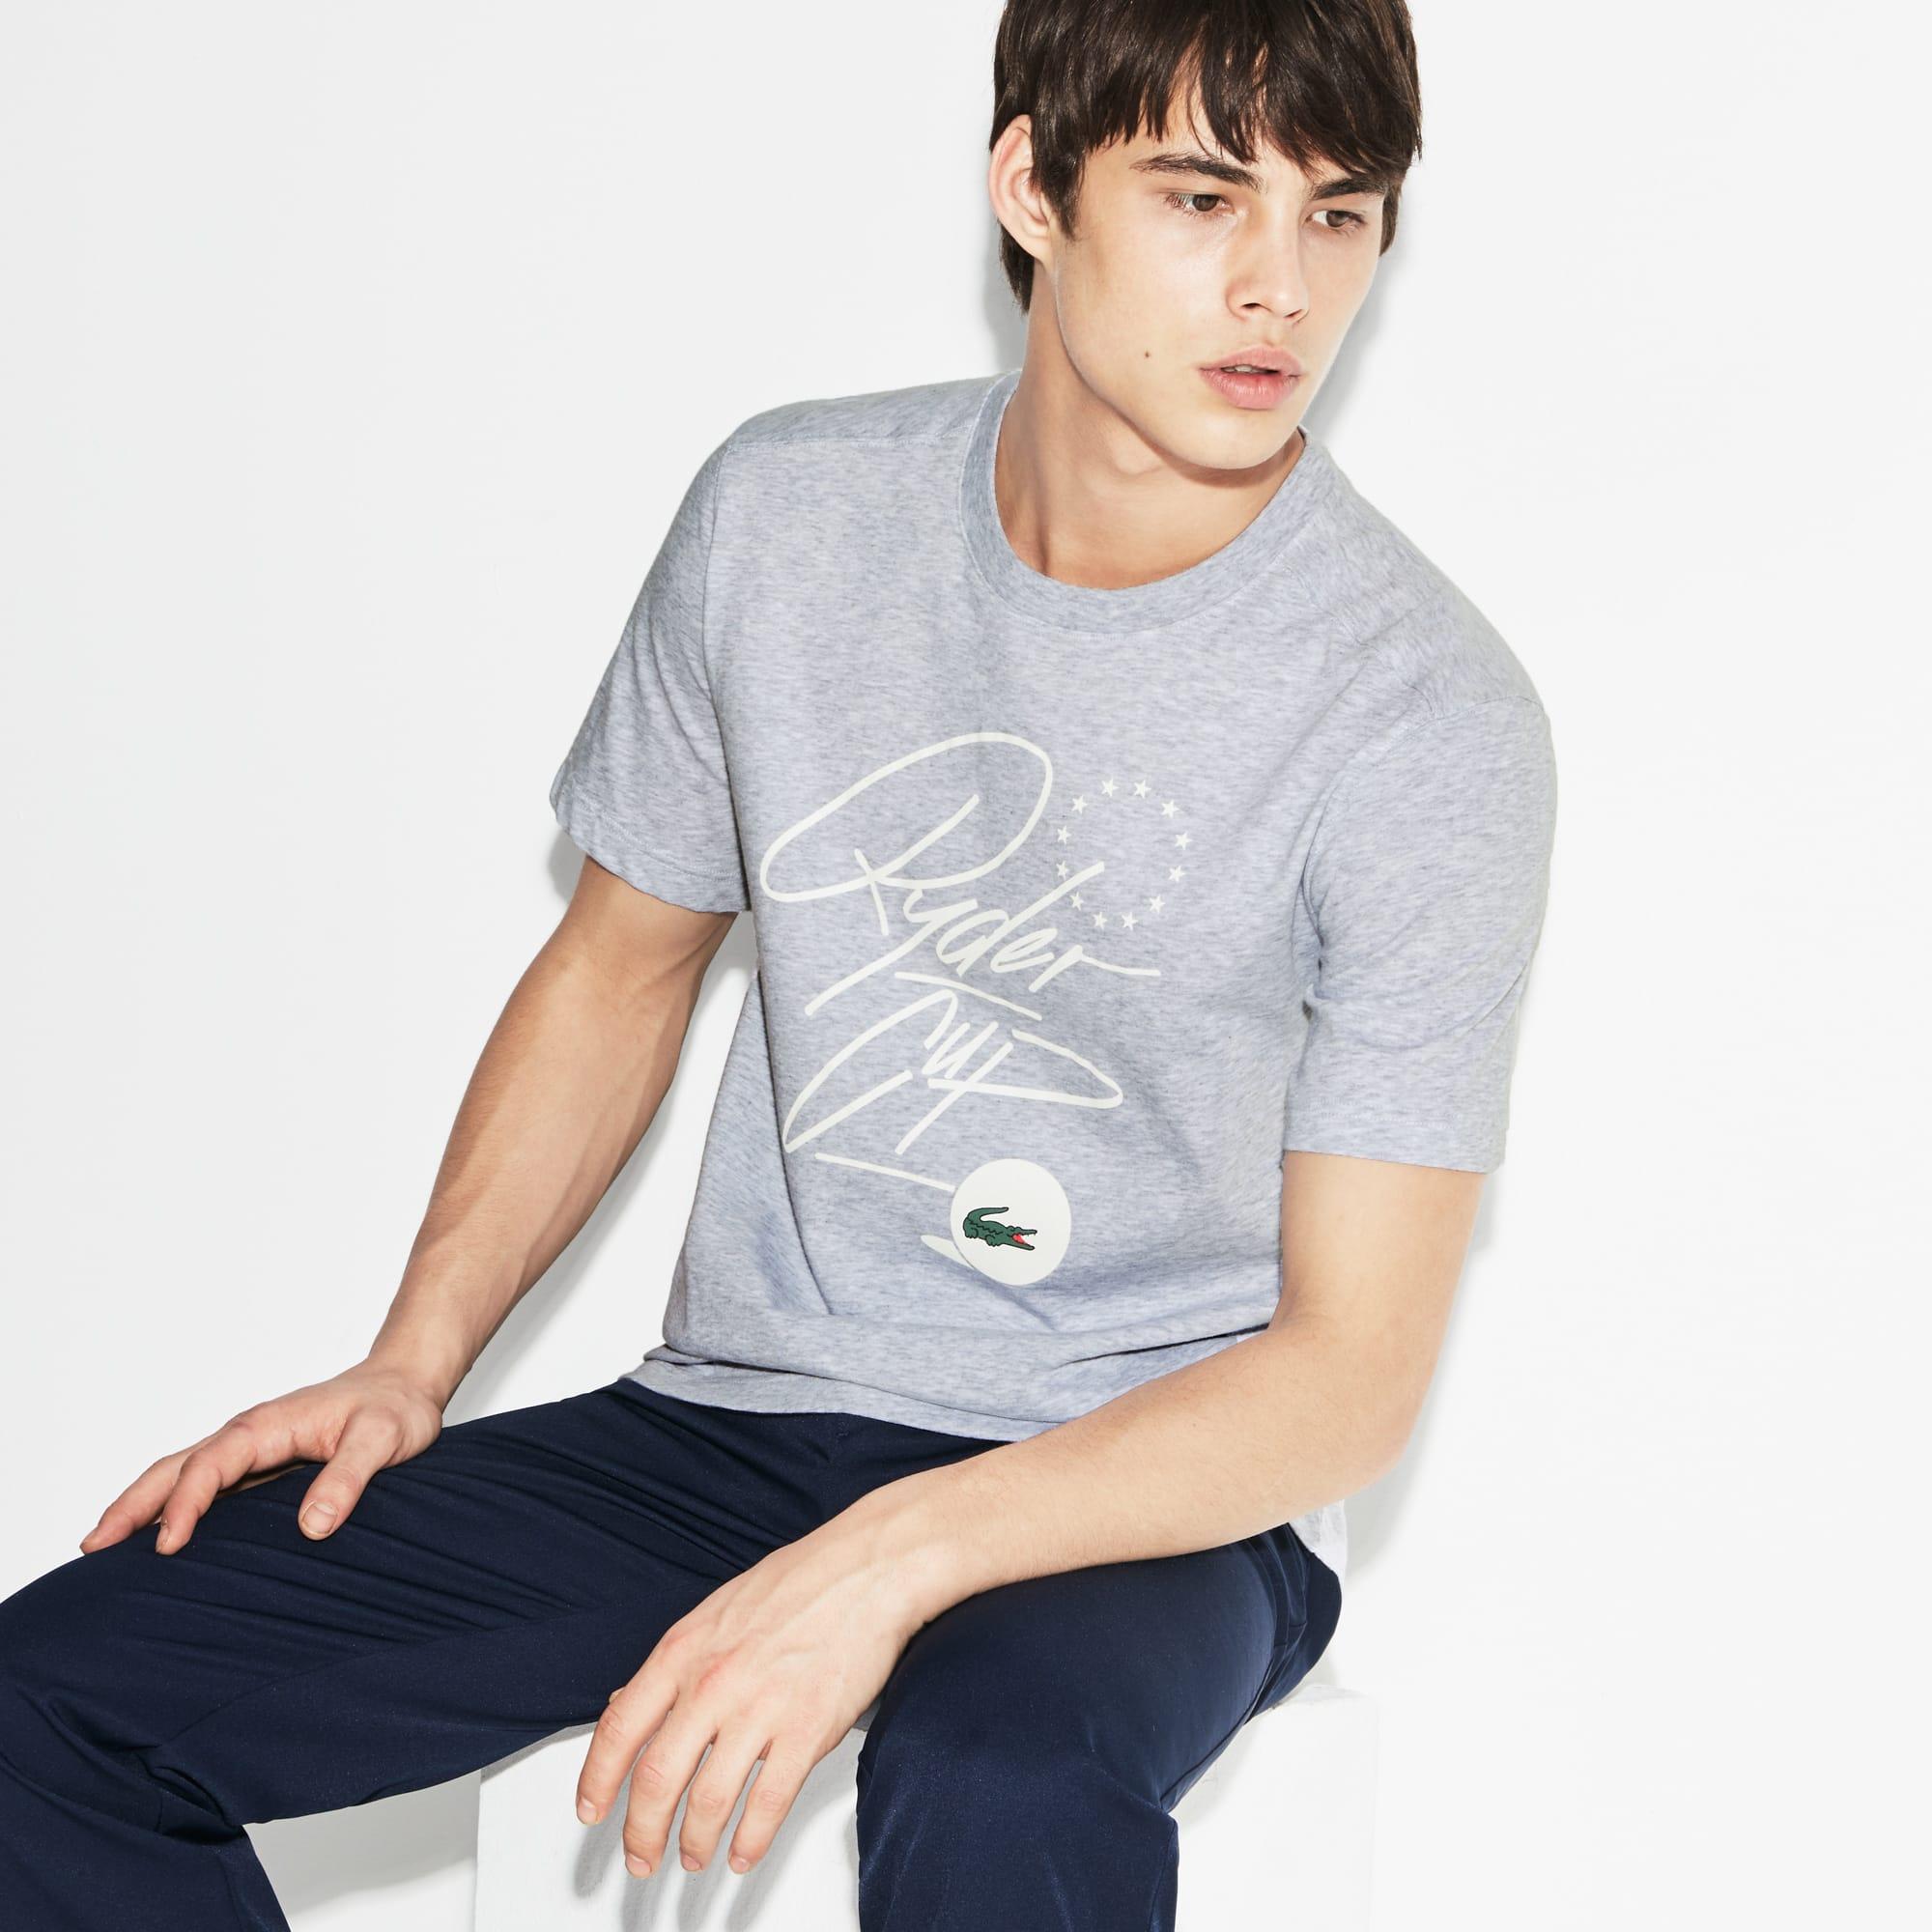 Herren LACOSTE SPORT Ryder Cup Edition Golf T-Shirt